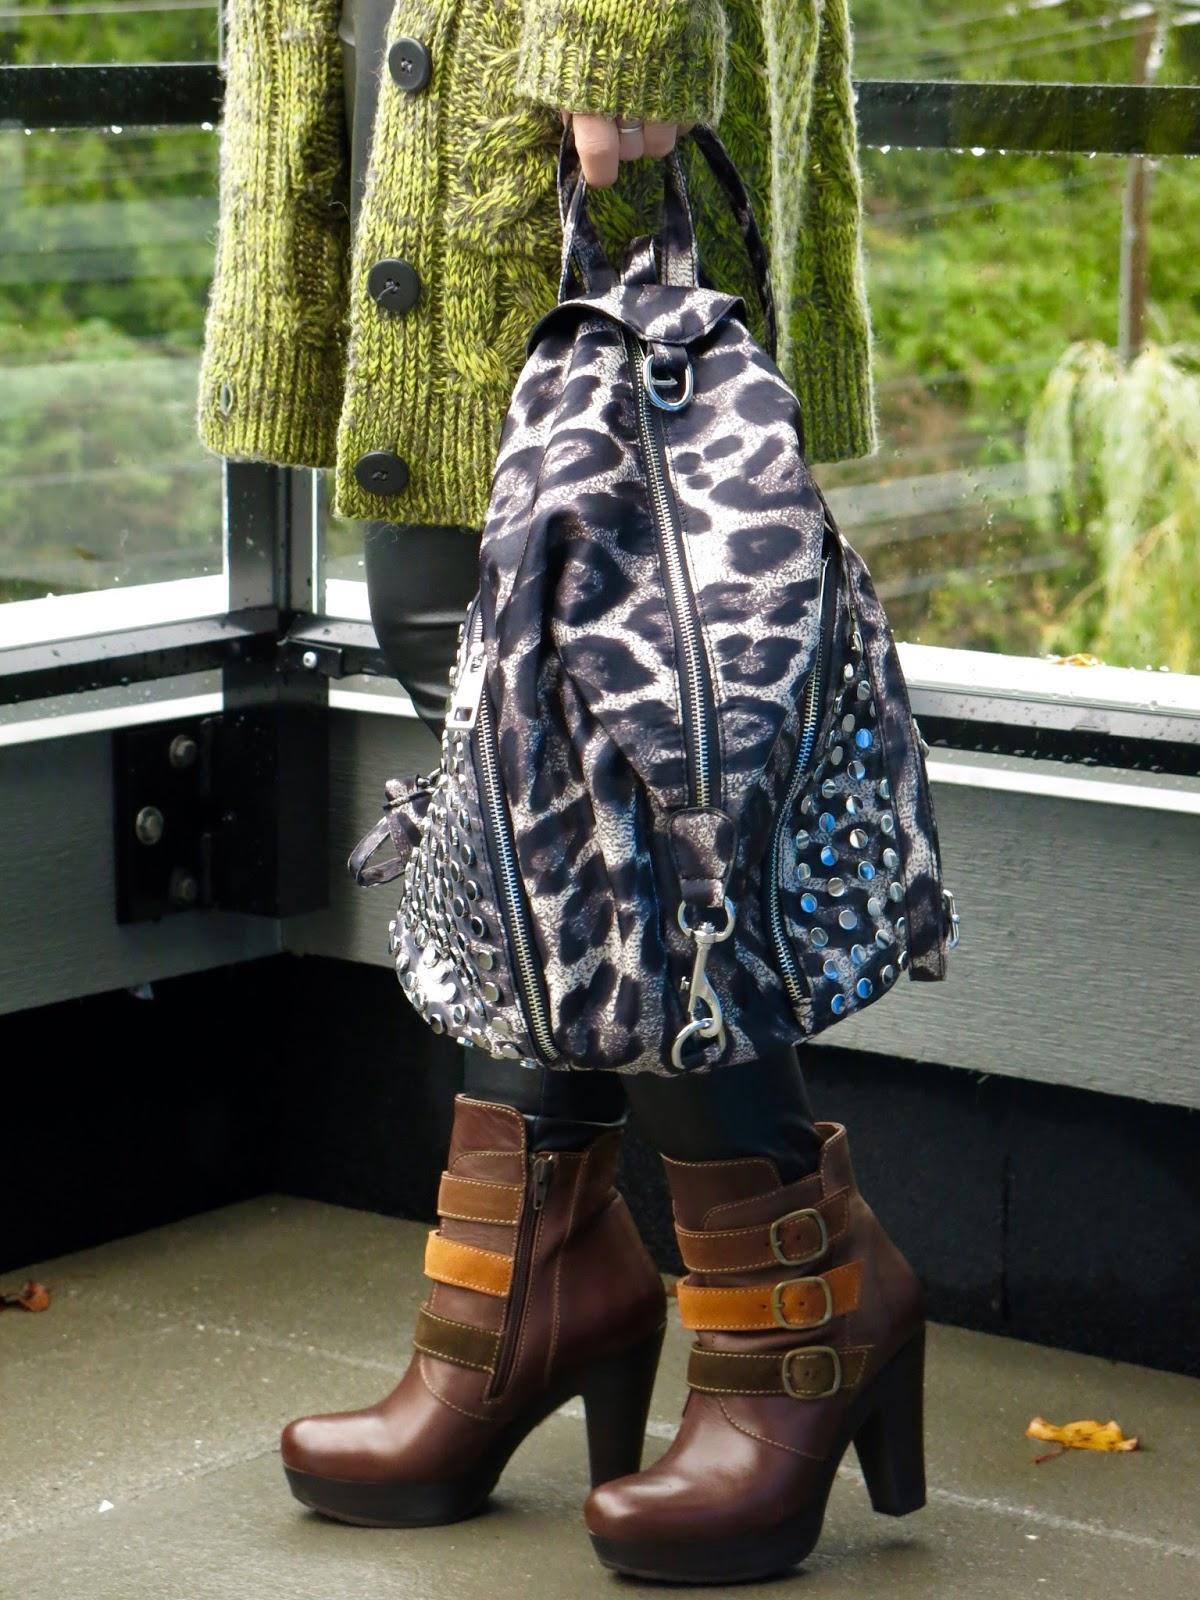 grandpa cardigan, faux-leather leggings, platform booties, and leopard-print backpack